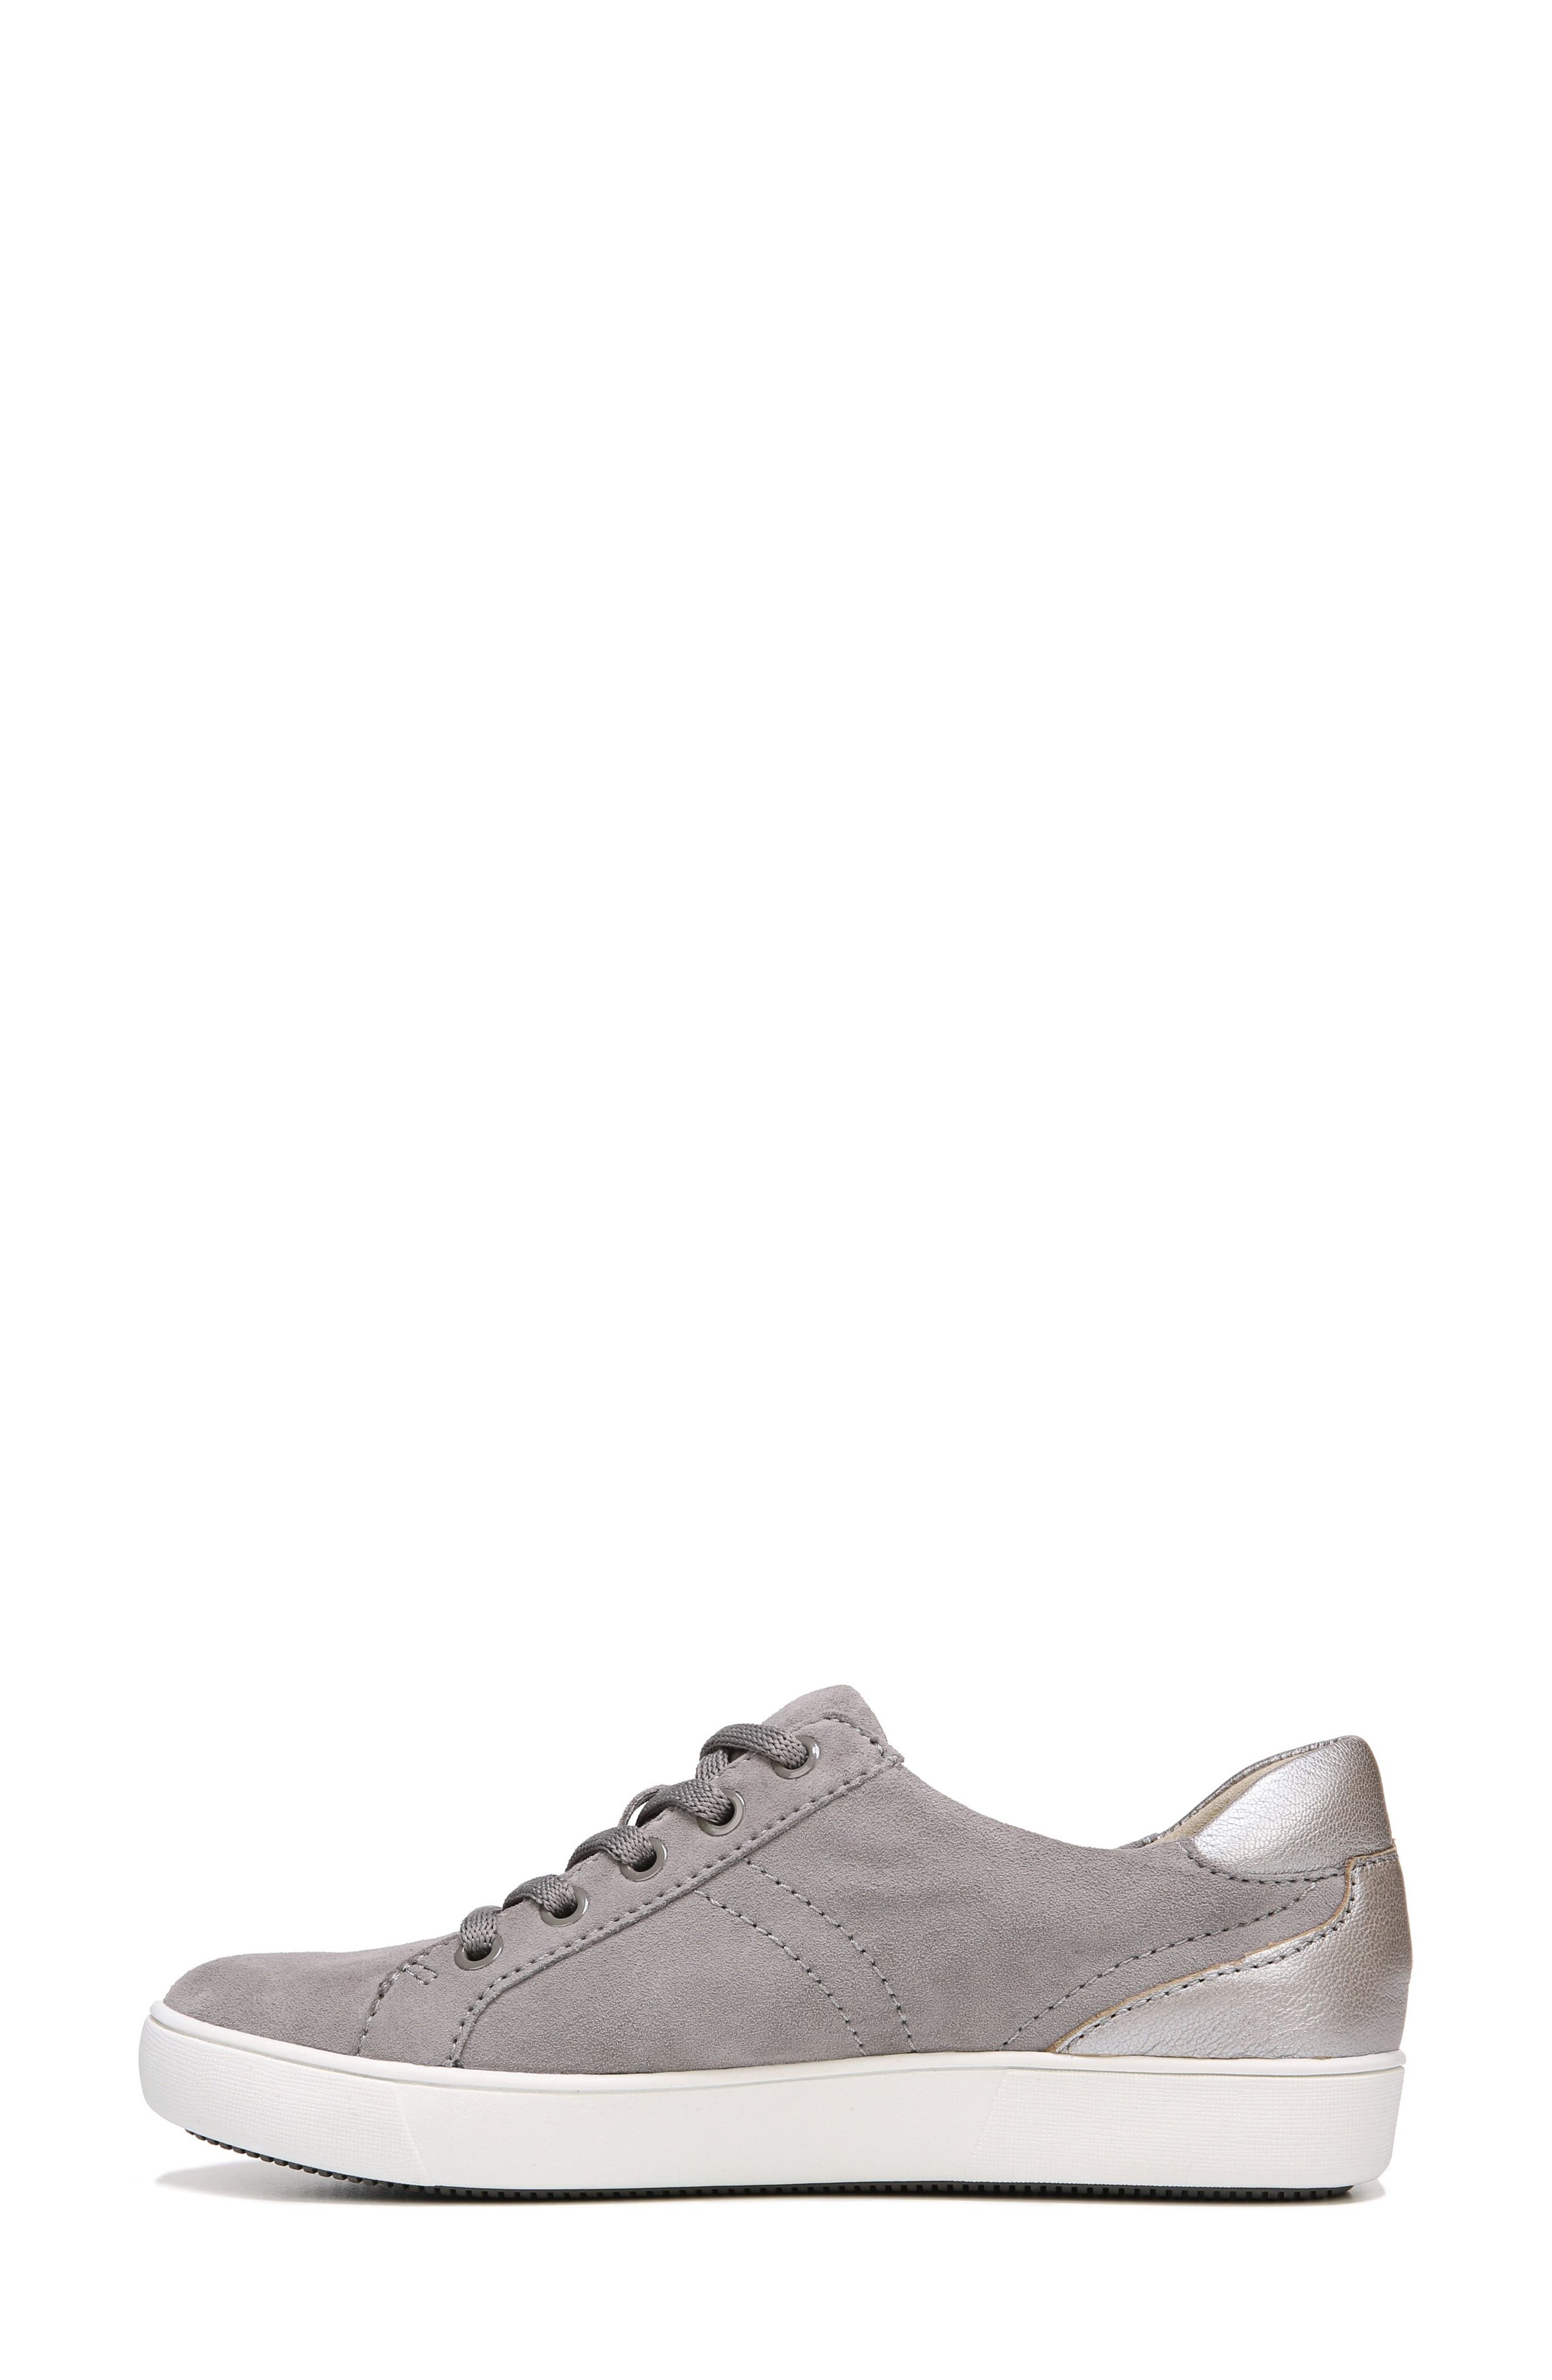 NATURALIZER, Morrison Sneaker, Alternate thumbnail 3, color, GREY SUEDE